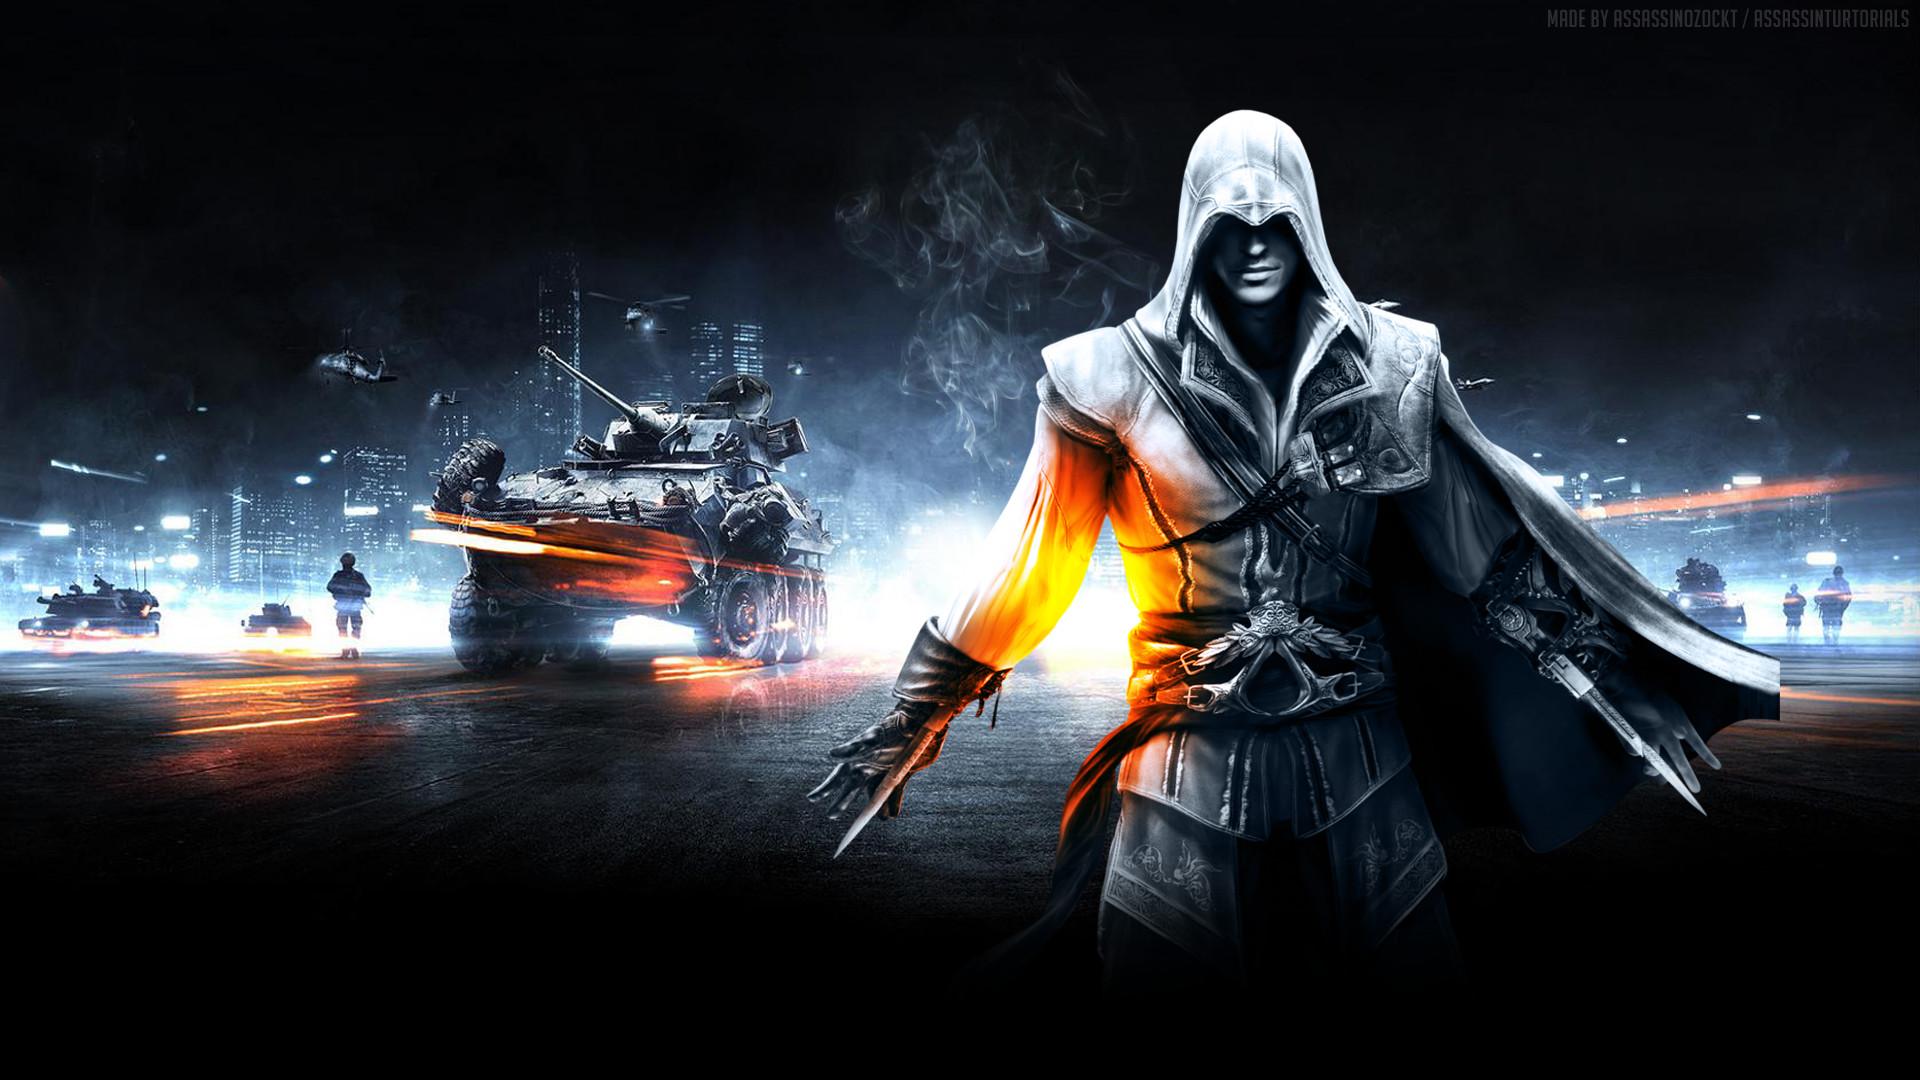 Video game wallpaper   Video Game – Collage – Assassins Creed – Battlefield  Wallpaper